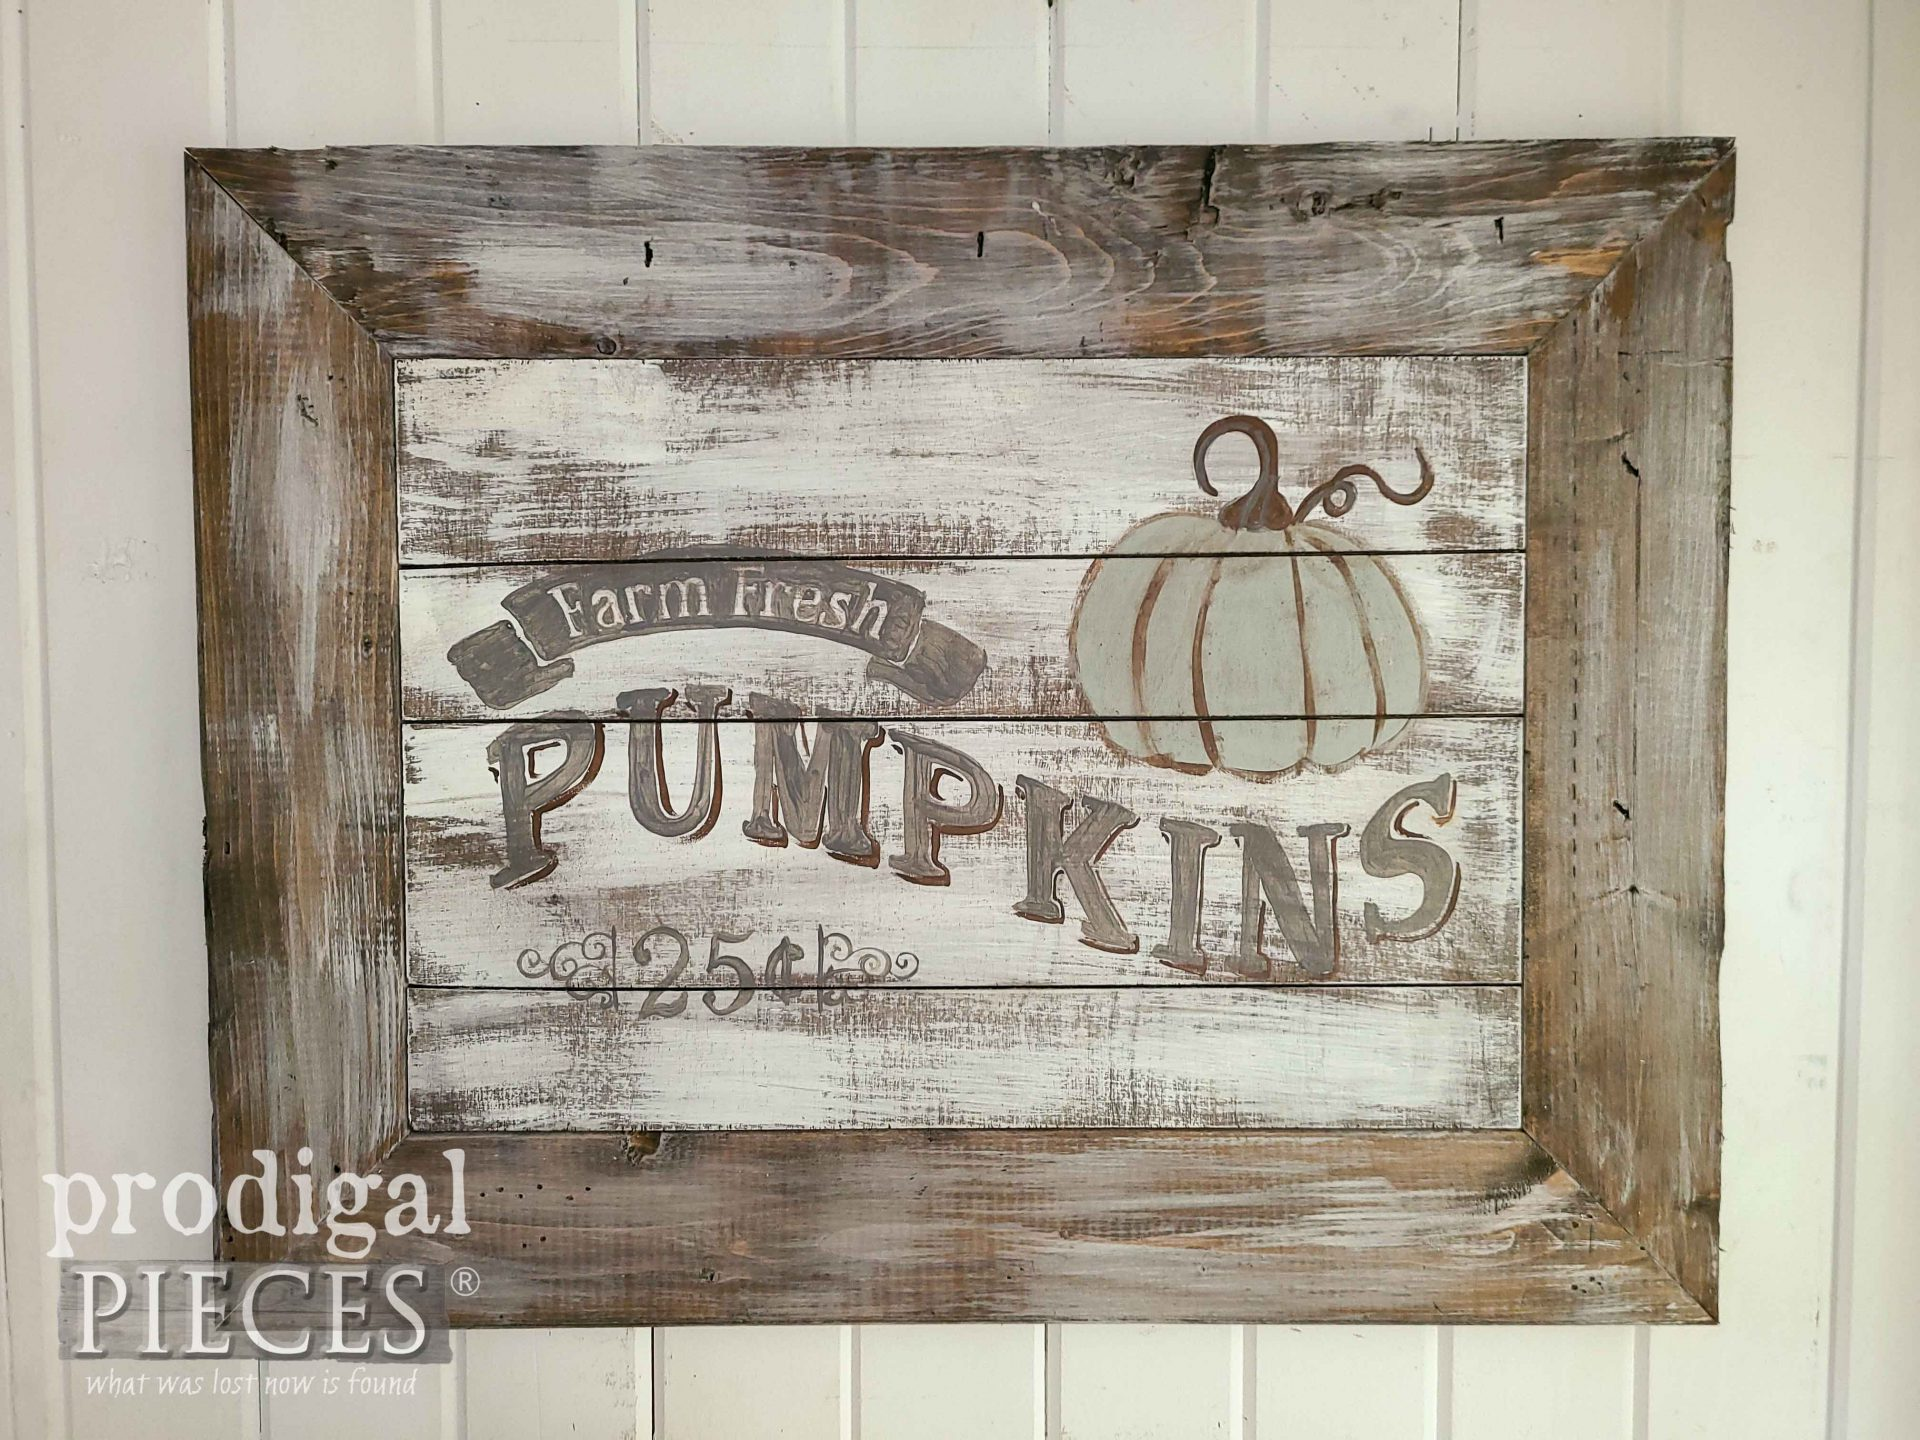 Farmhouse Chic DIY Harvest Sign by Larissa of Prodigal Pieces   prodigalpieces.com #prodigalpieces #diy #home #homedecor #farmhouse